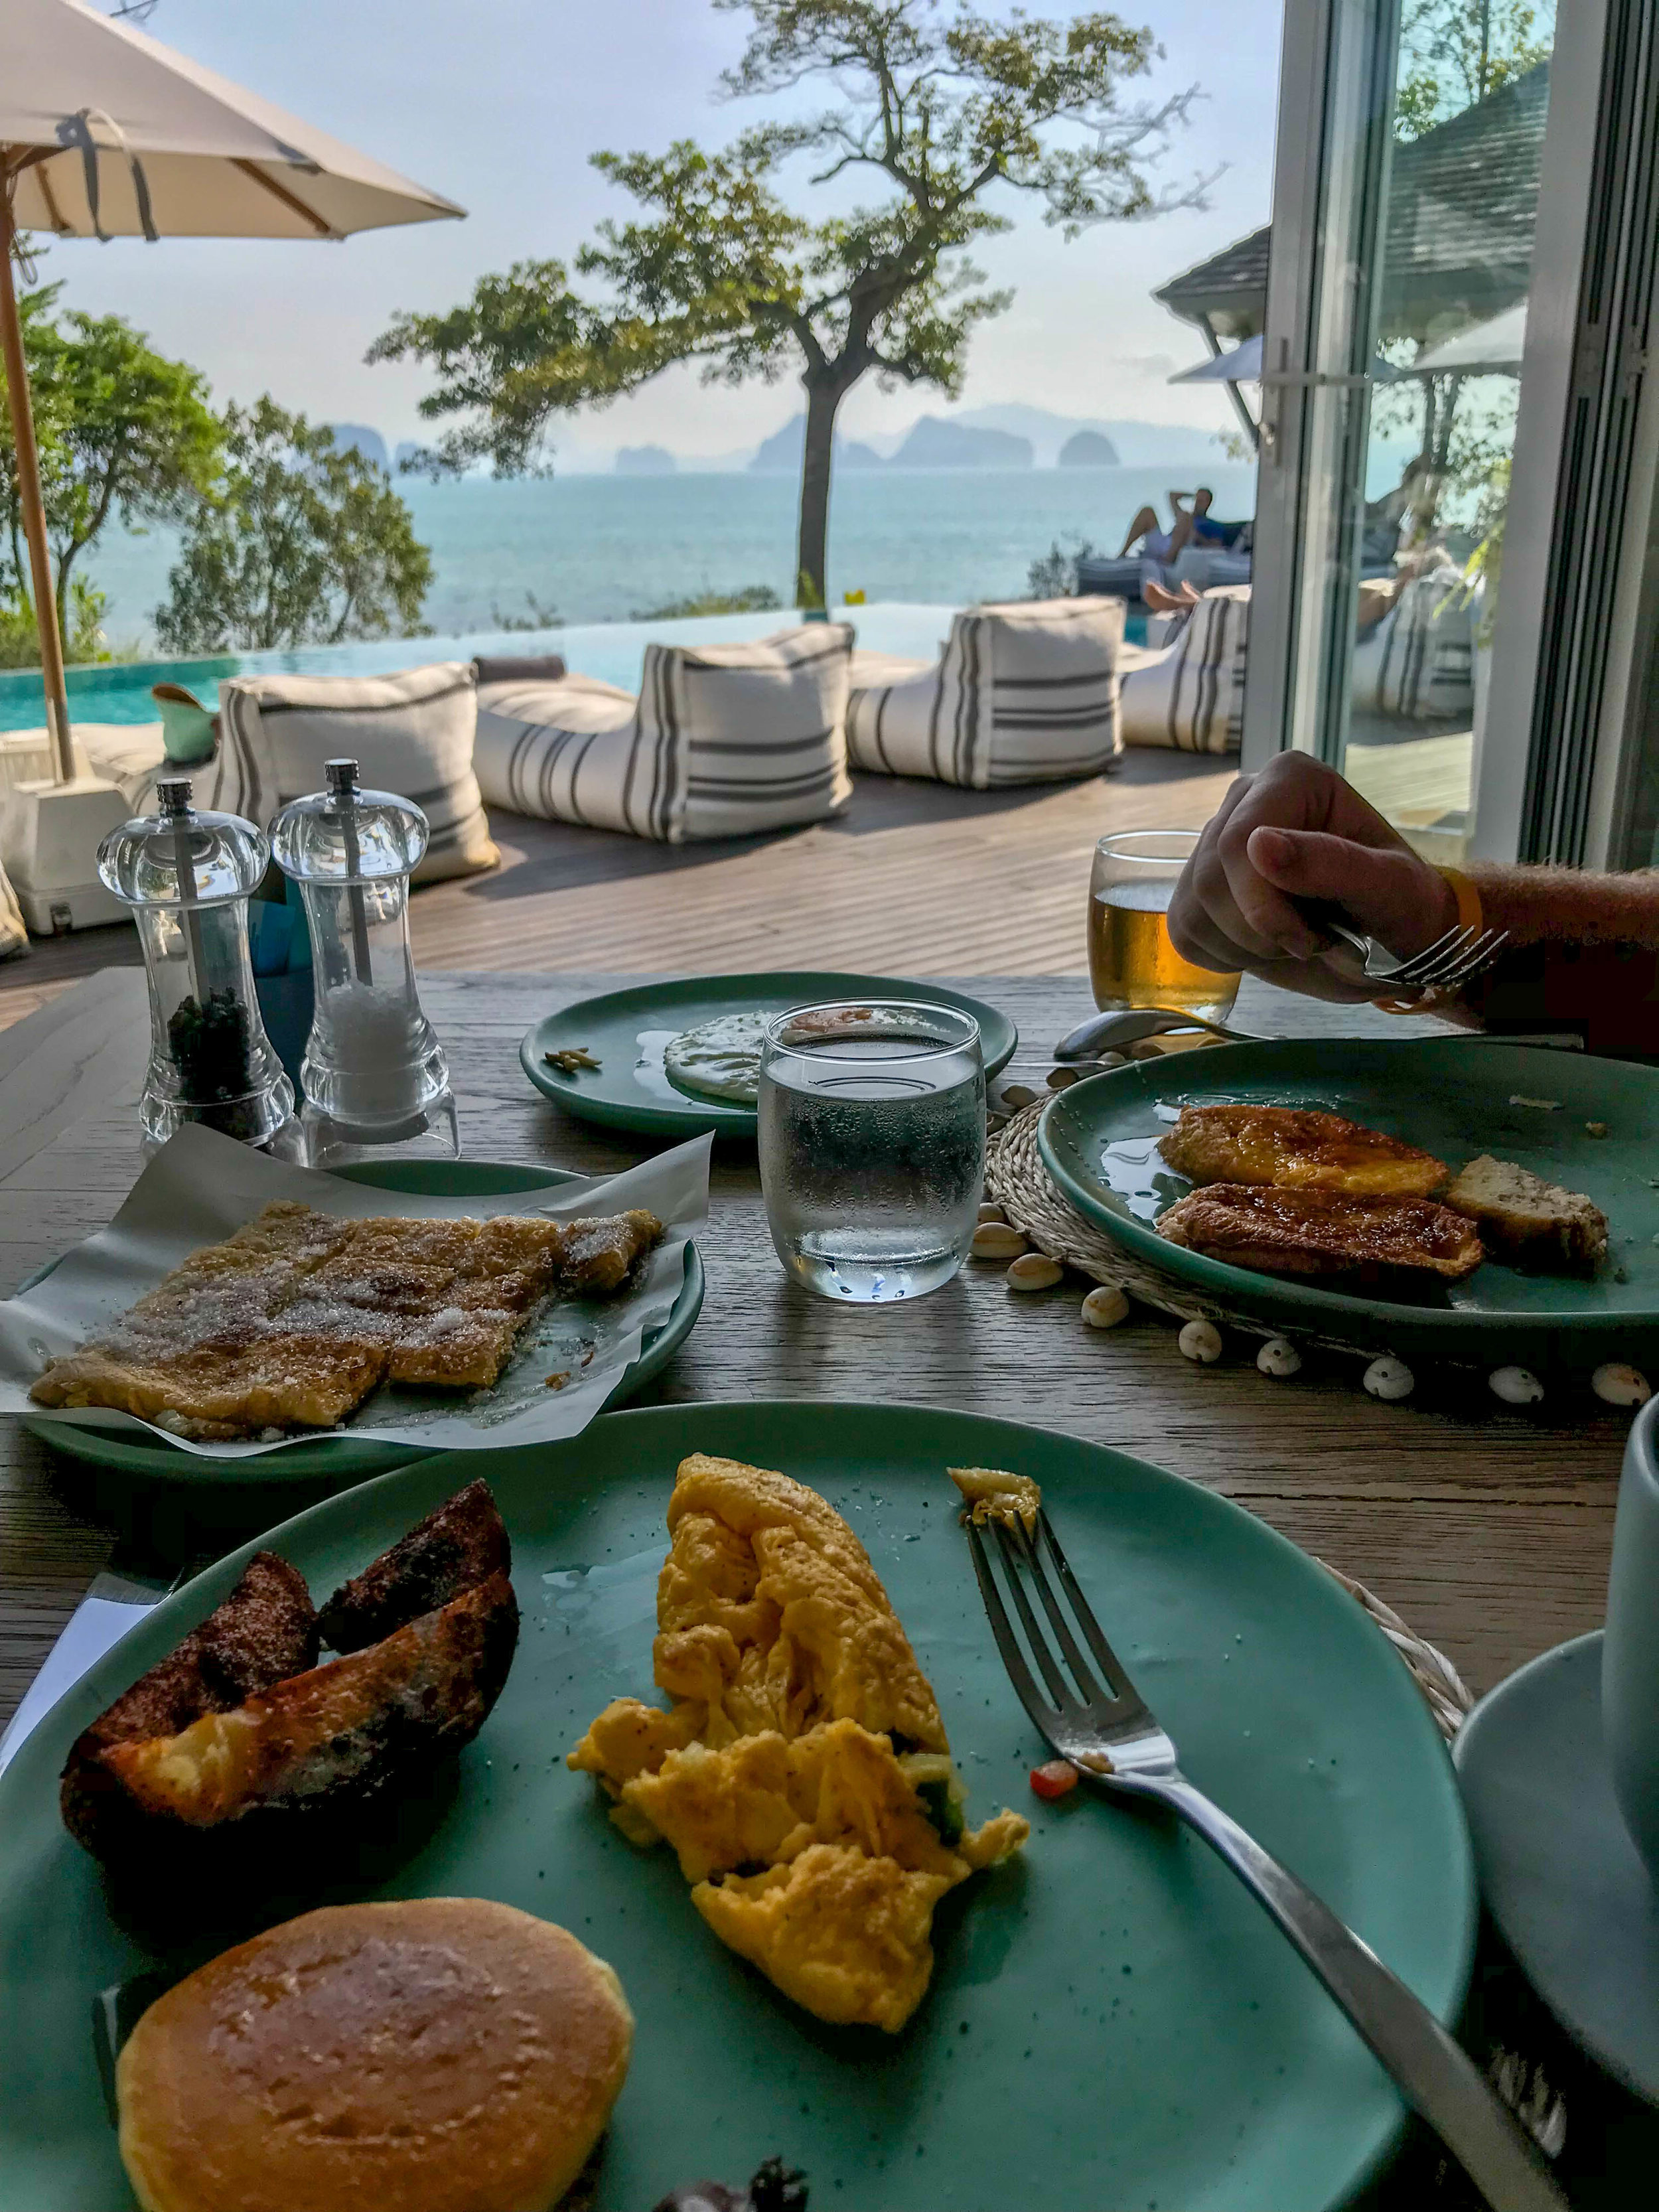 Cade Kudu Hotel - Koi Yao Noi, Thailand - Hornbill Restaurant Breakfast Buffet